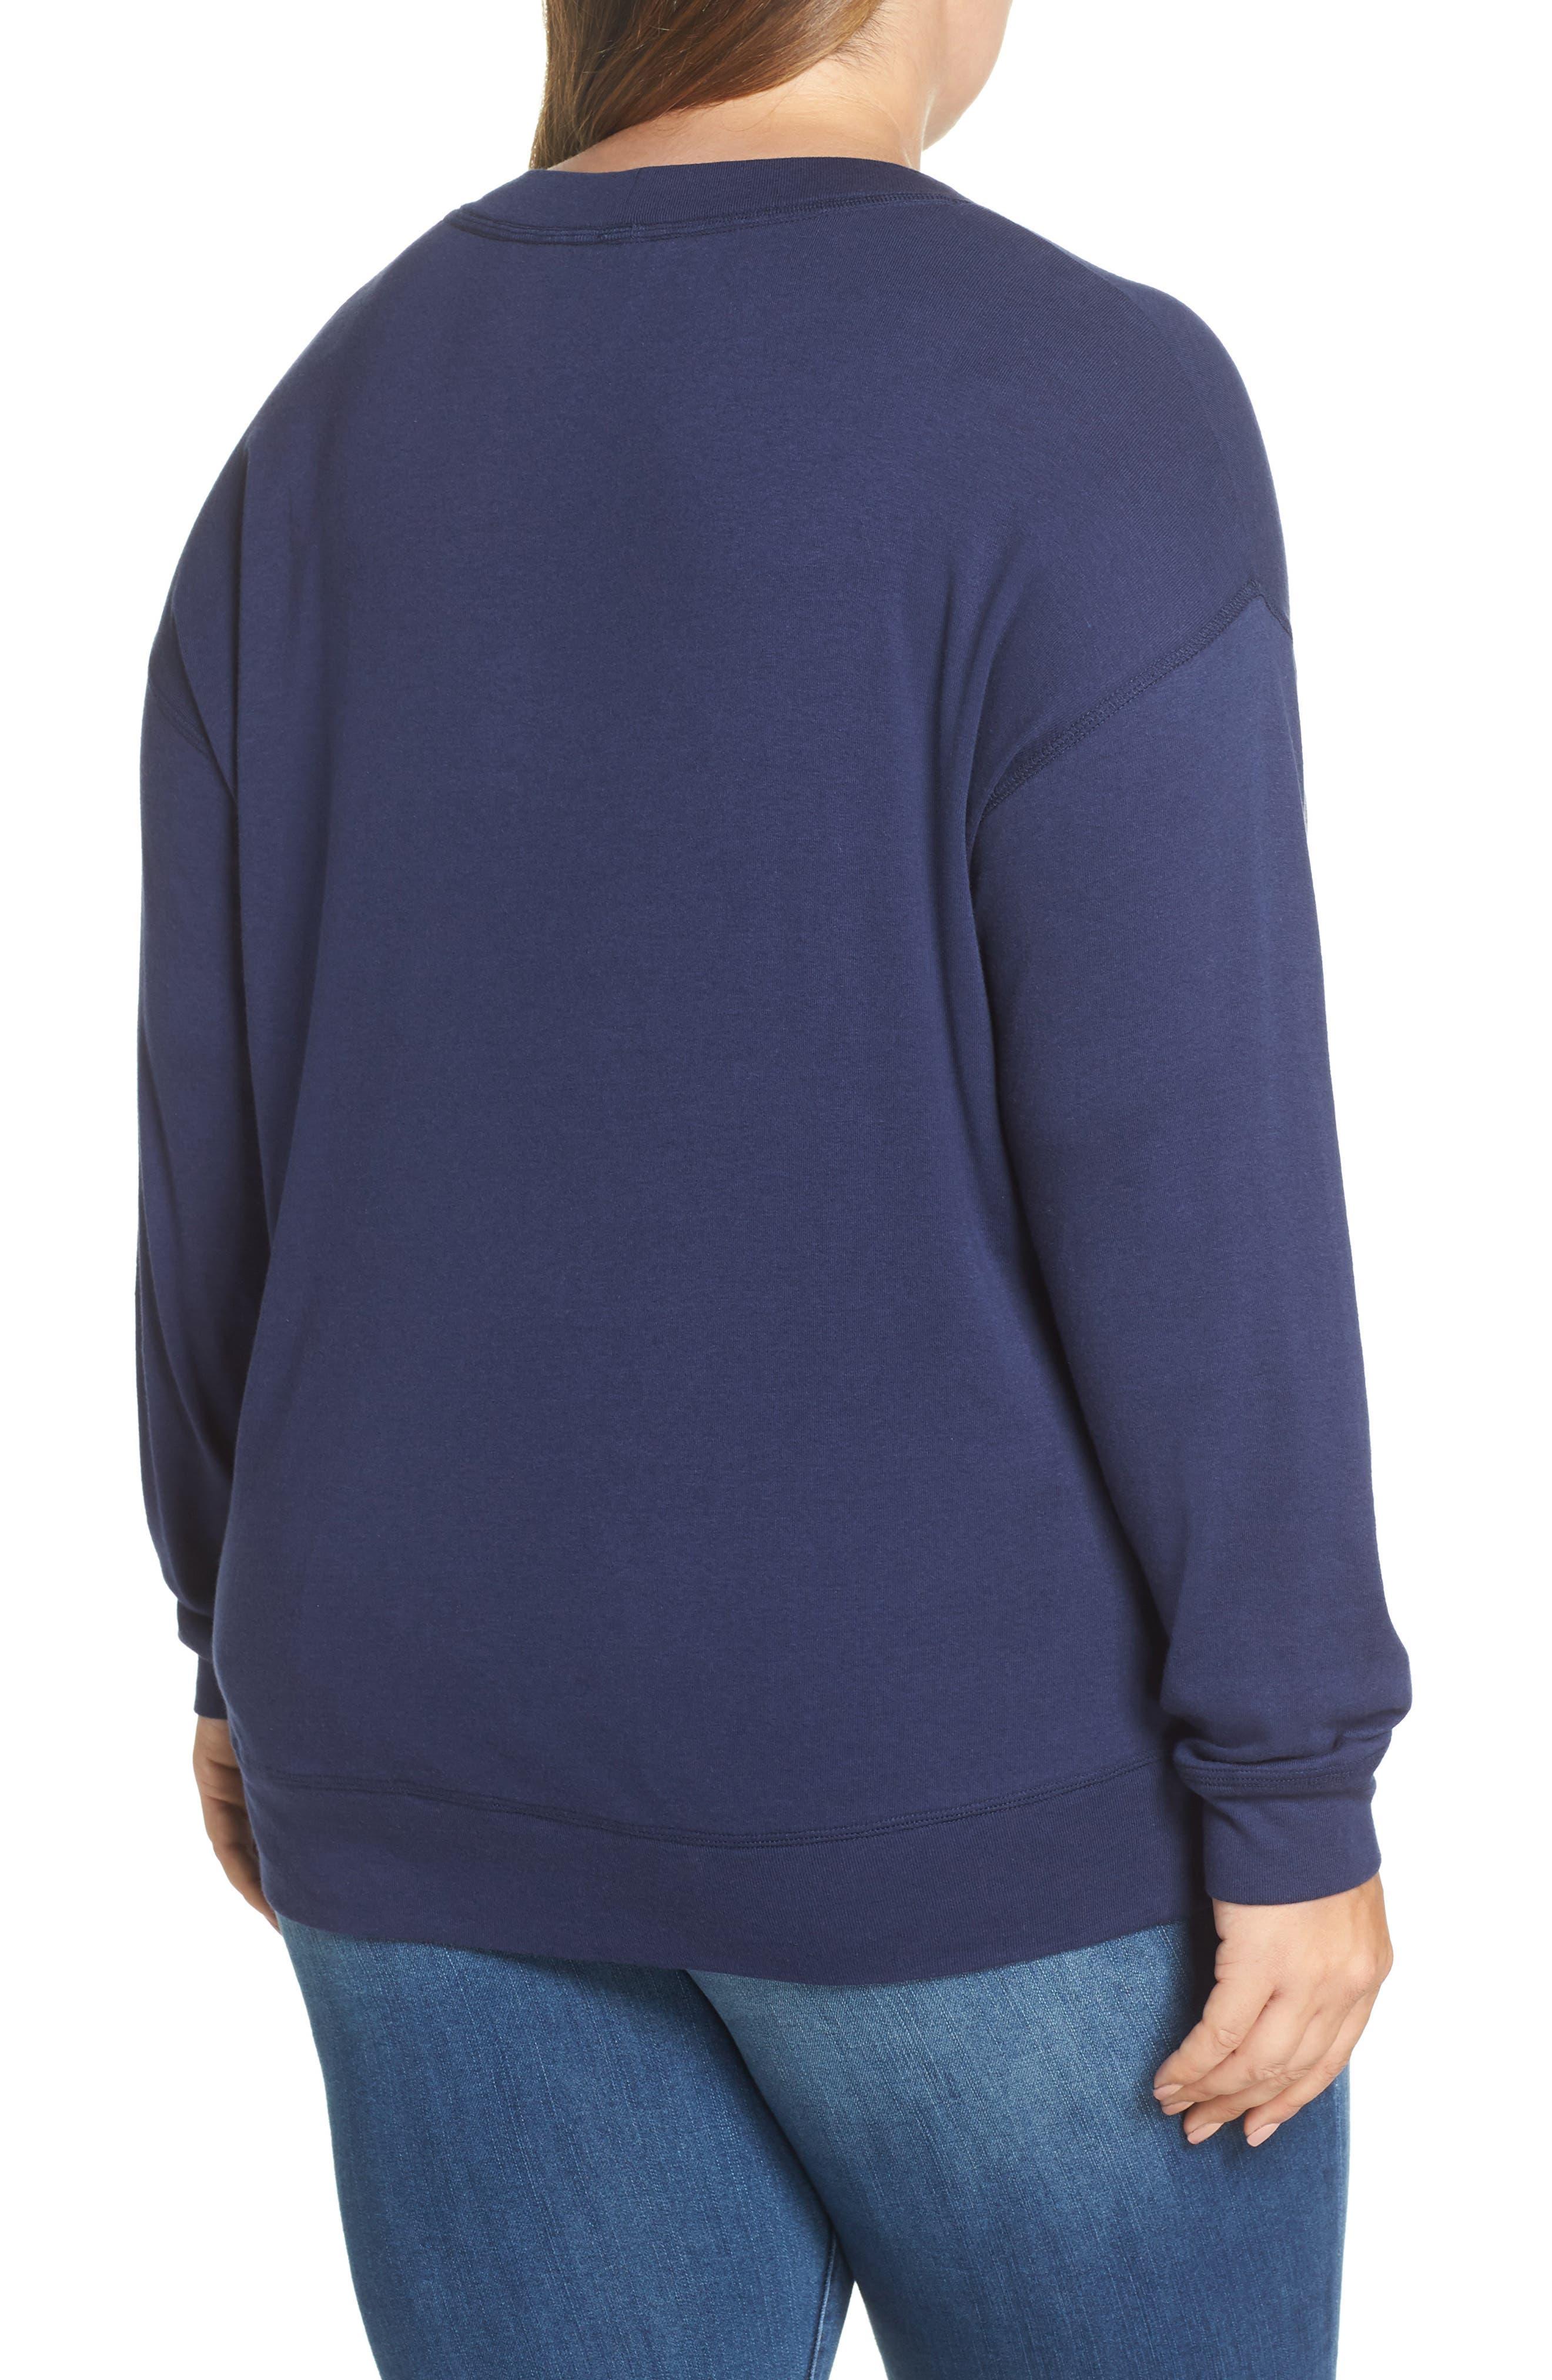 CASLON<SUP>®</SUP>, Crewneck Sweatshirt, Alternate thumbnail 2, color, NAVY PEACOAT